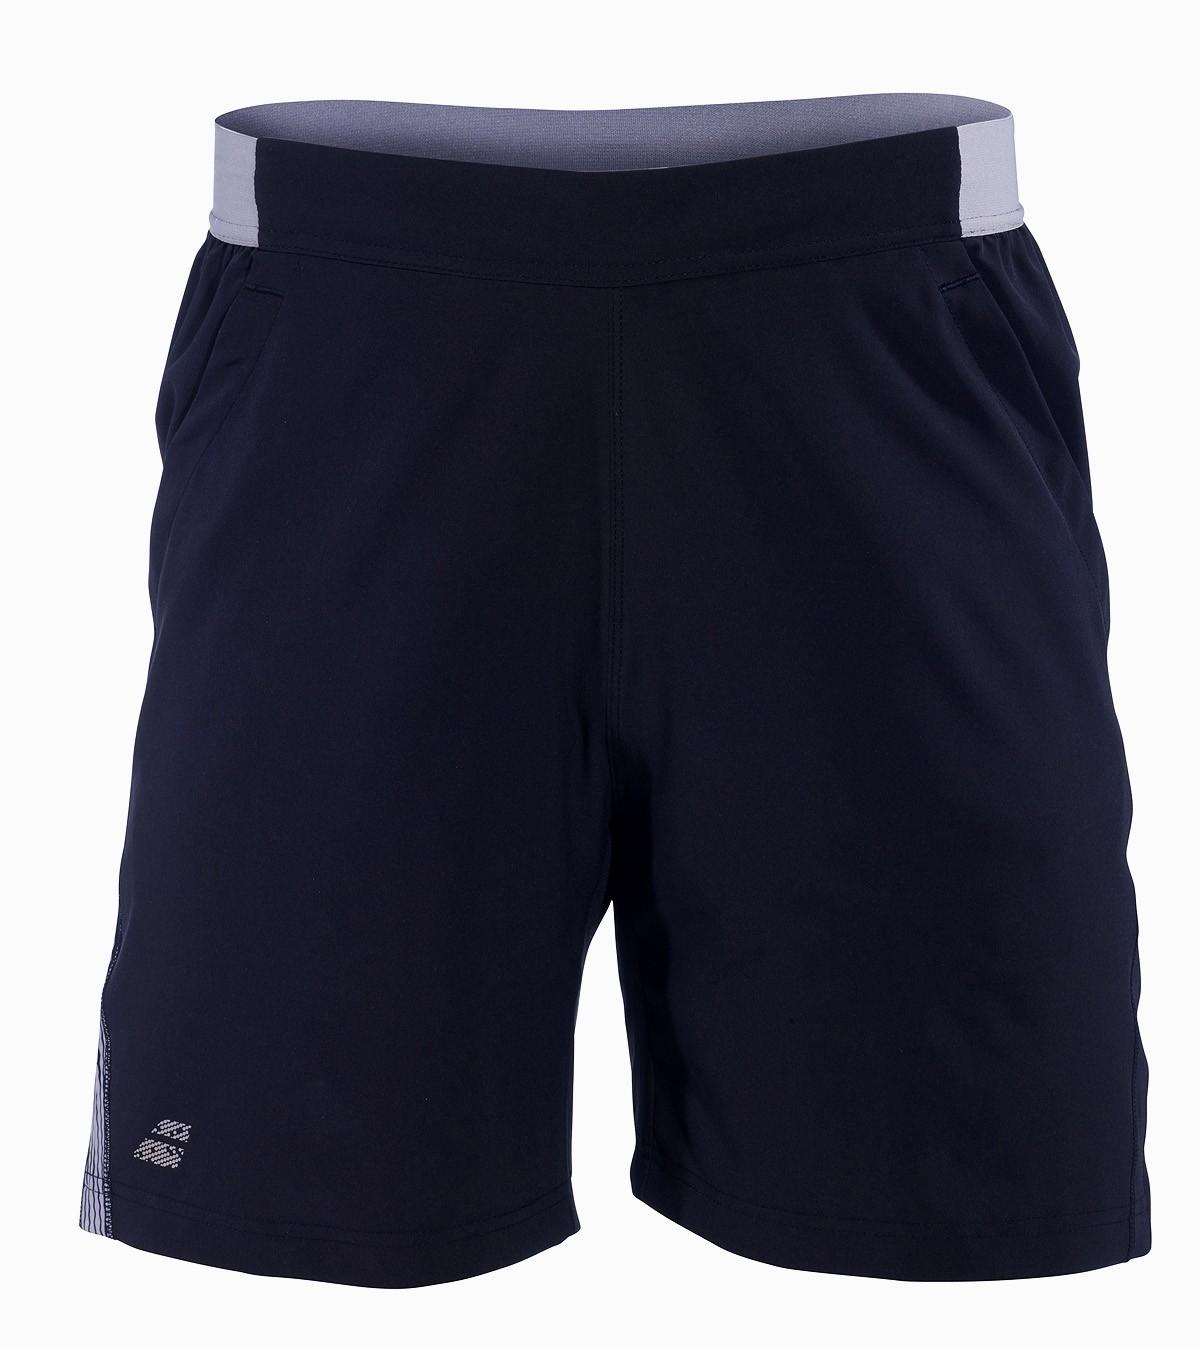 Spodenki tenisowe chłopięce Babolat PERF Short Black -45%